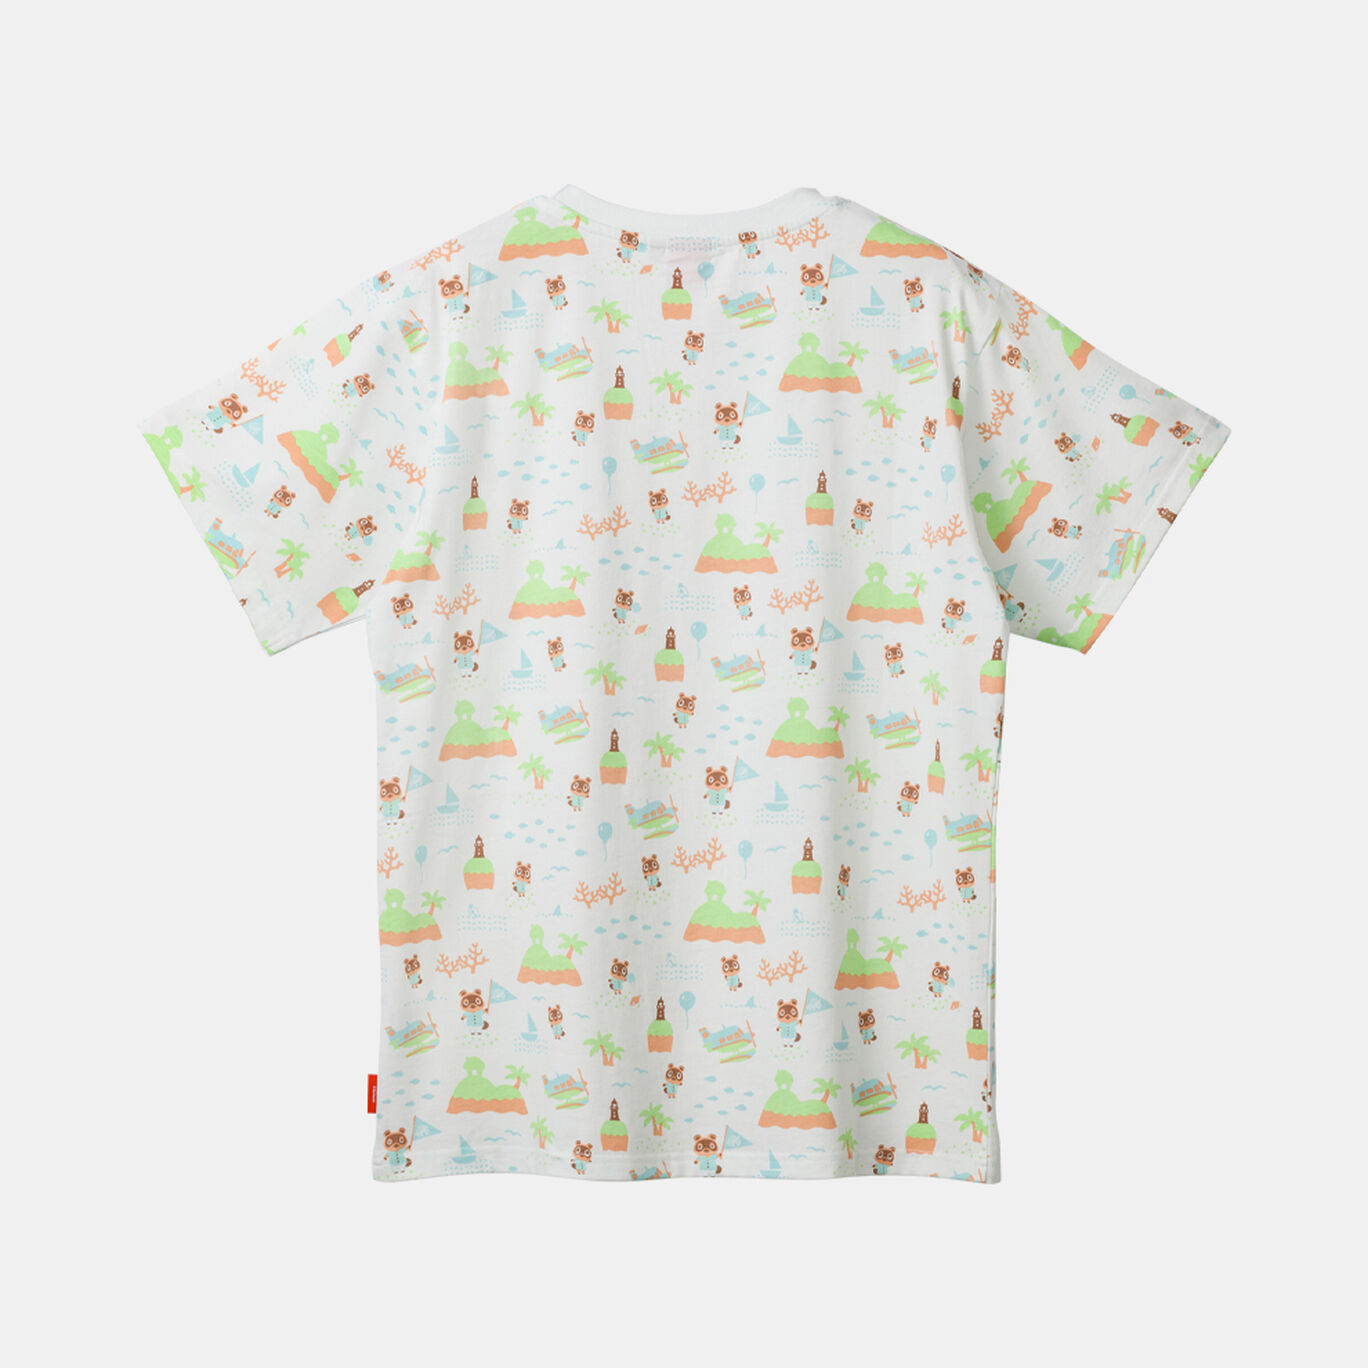 TシャツB XL あつまれ どうぶつの森【Nintendo TOKYO取り扱い商品】